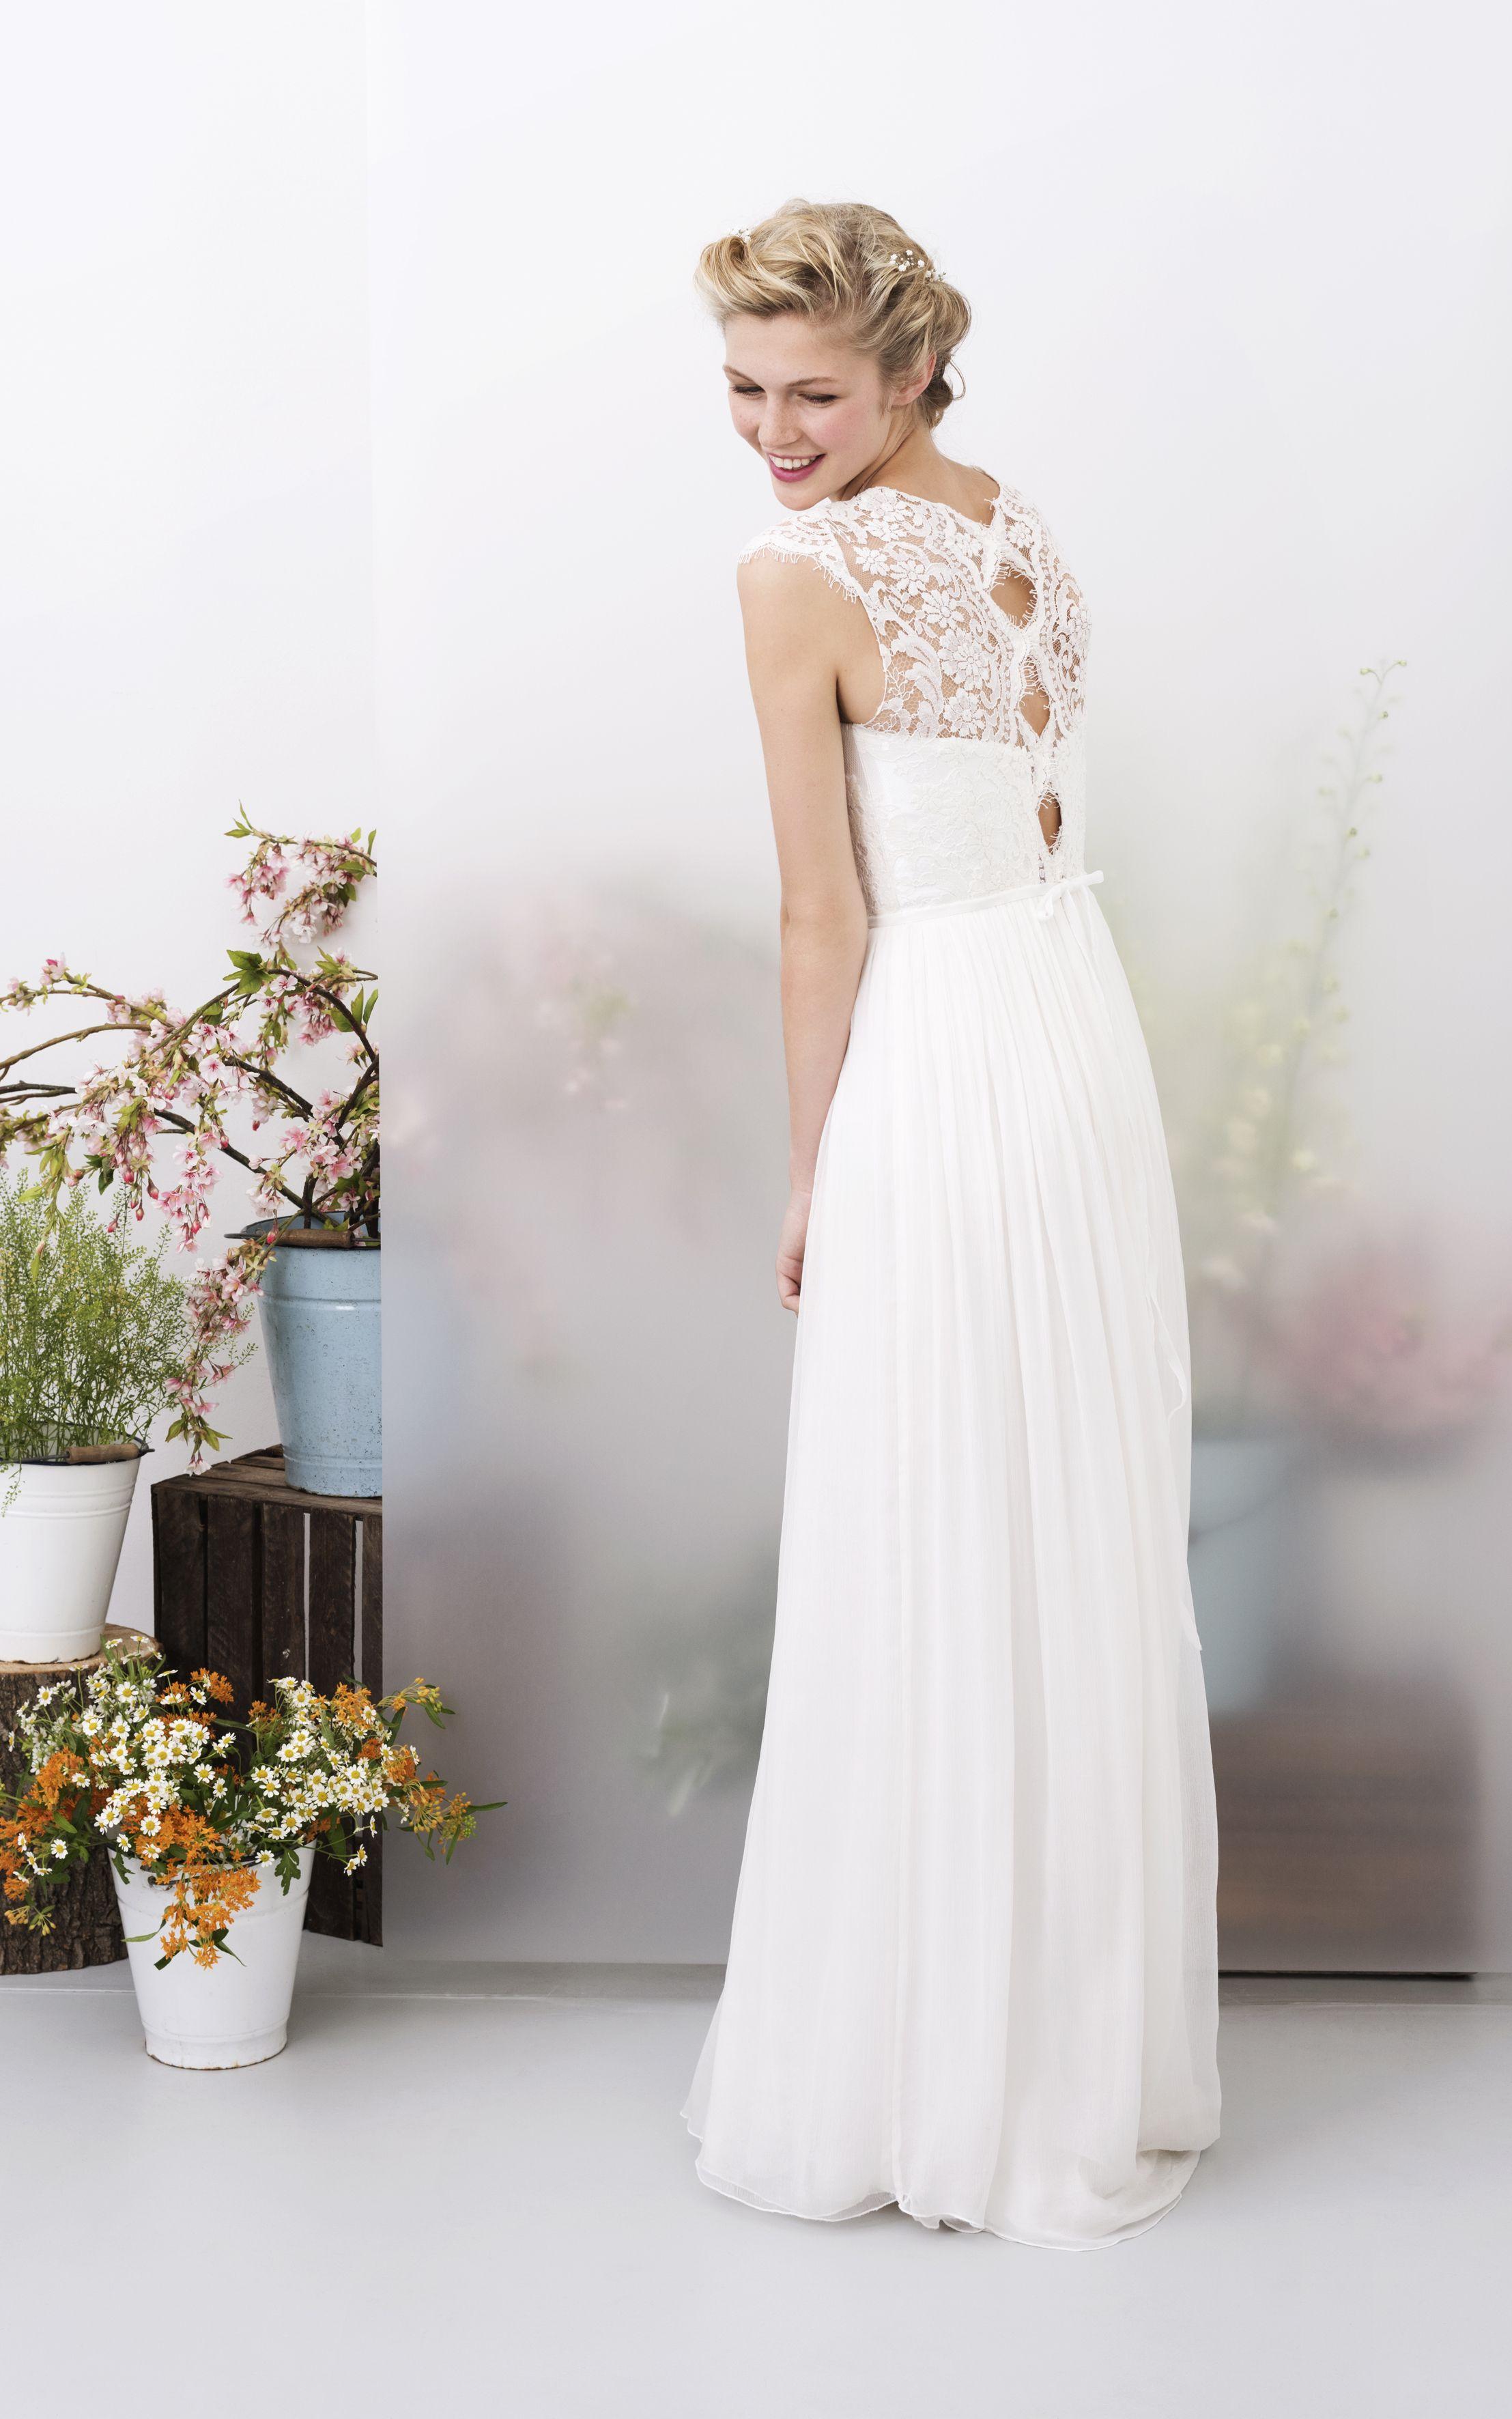 kisui OUI Collection Bridal Style: marill, Brautkleid, Weddingdress ...